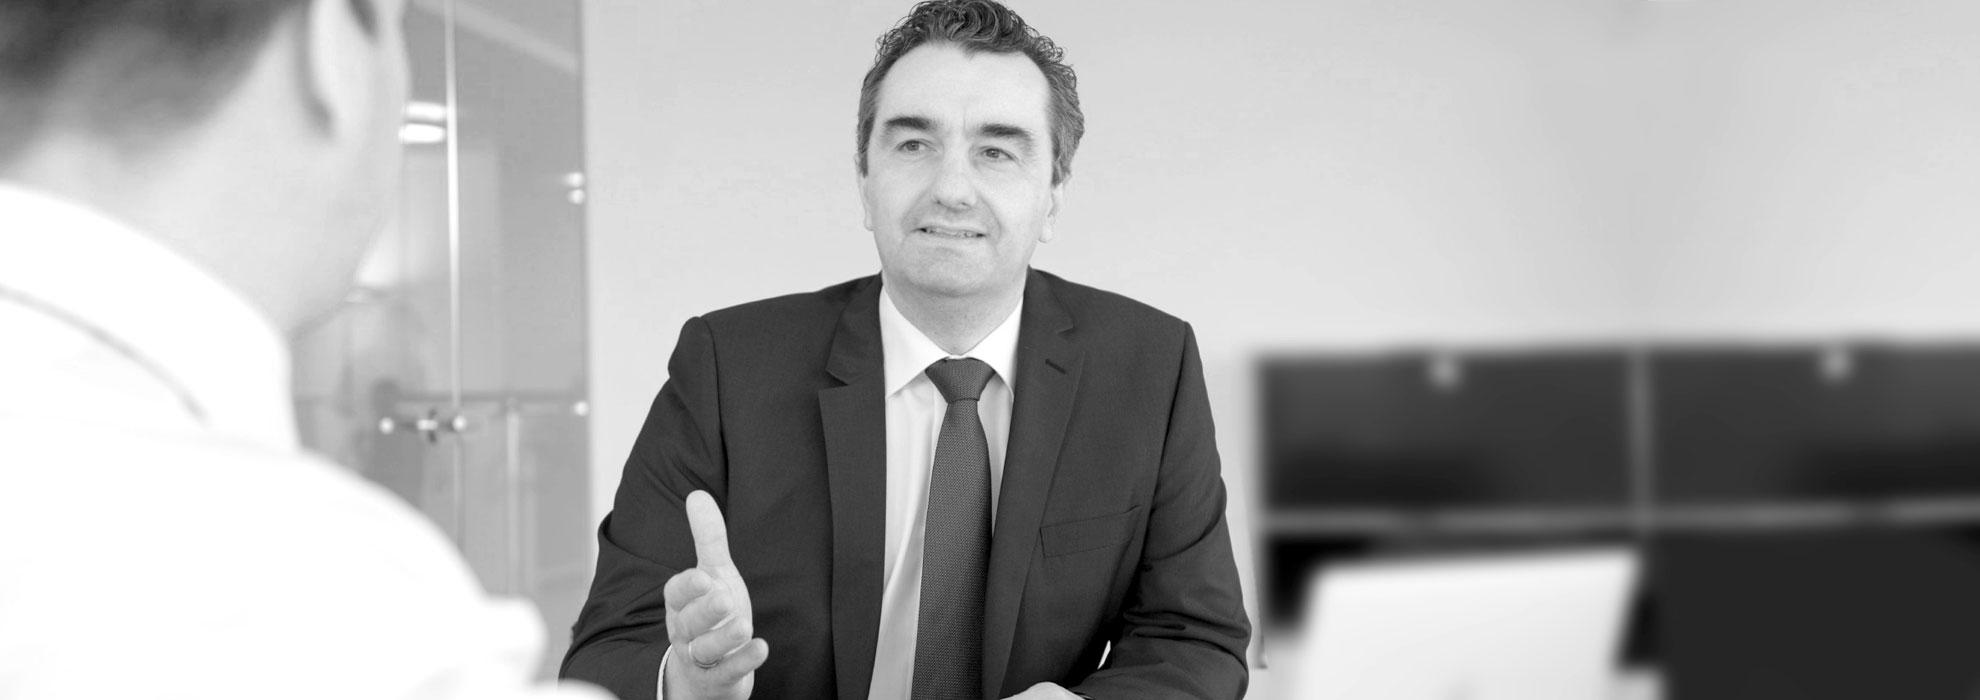 Markus Nowak Rechtsanwalt